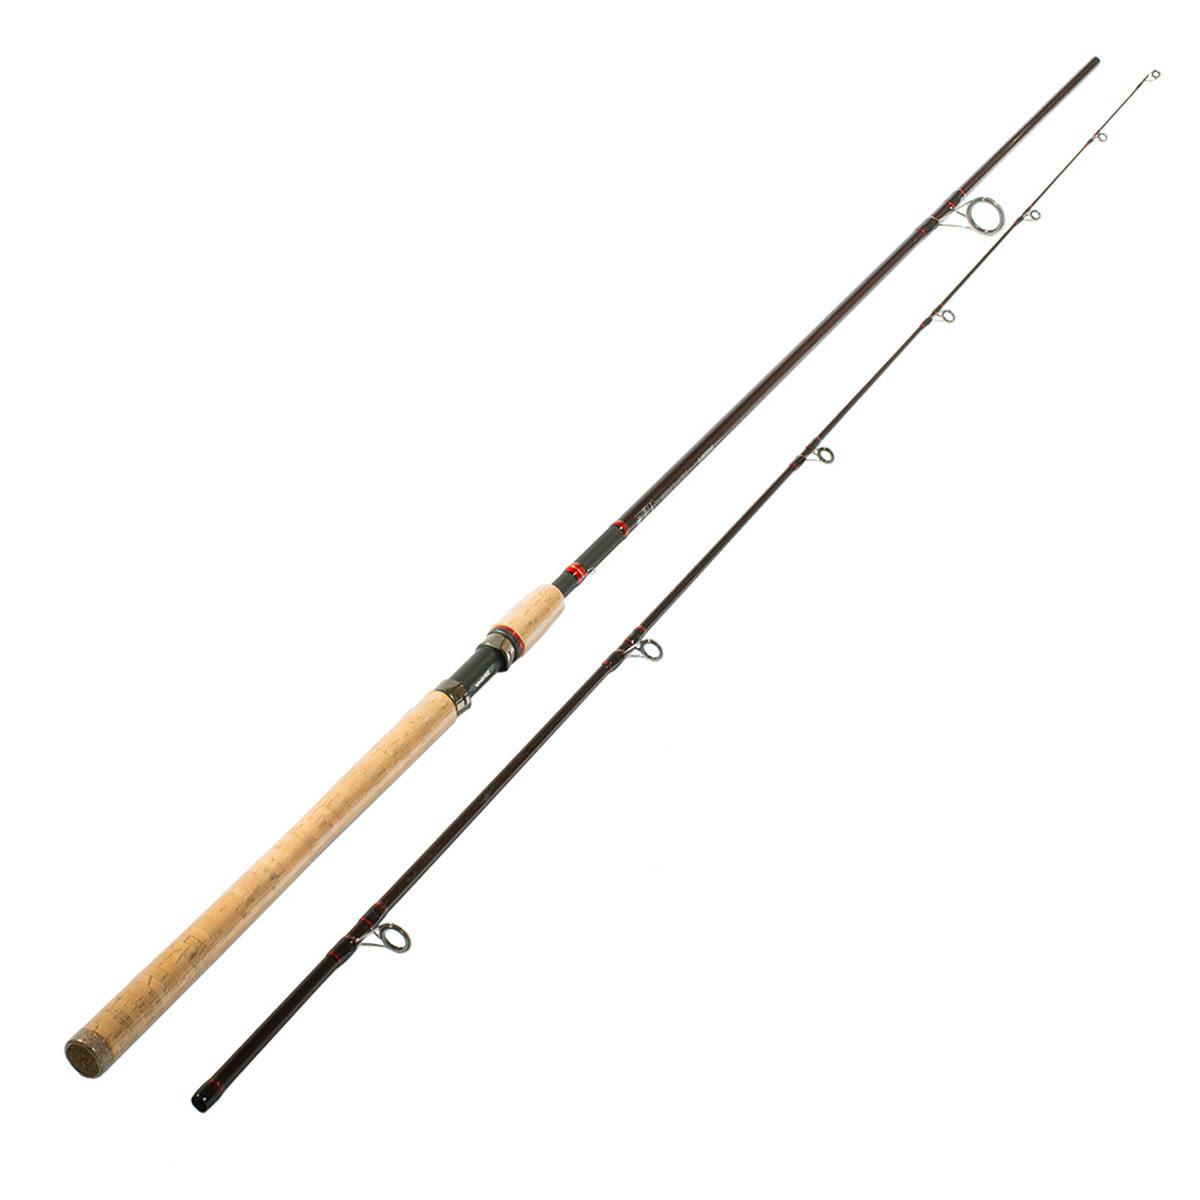 Спиннинг штекерный Daiwa Sweepfire, 2,7 м, 20-60 г